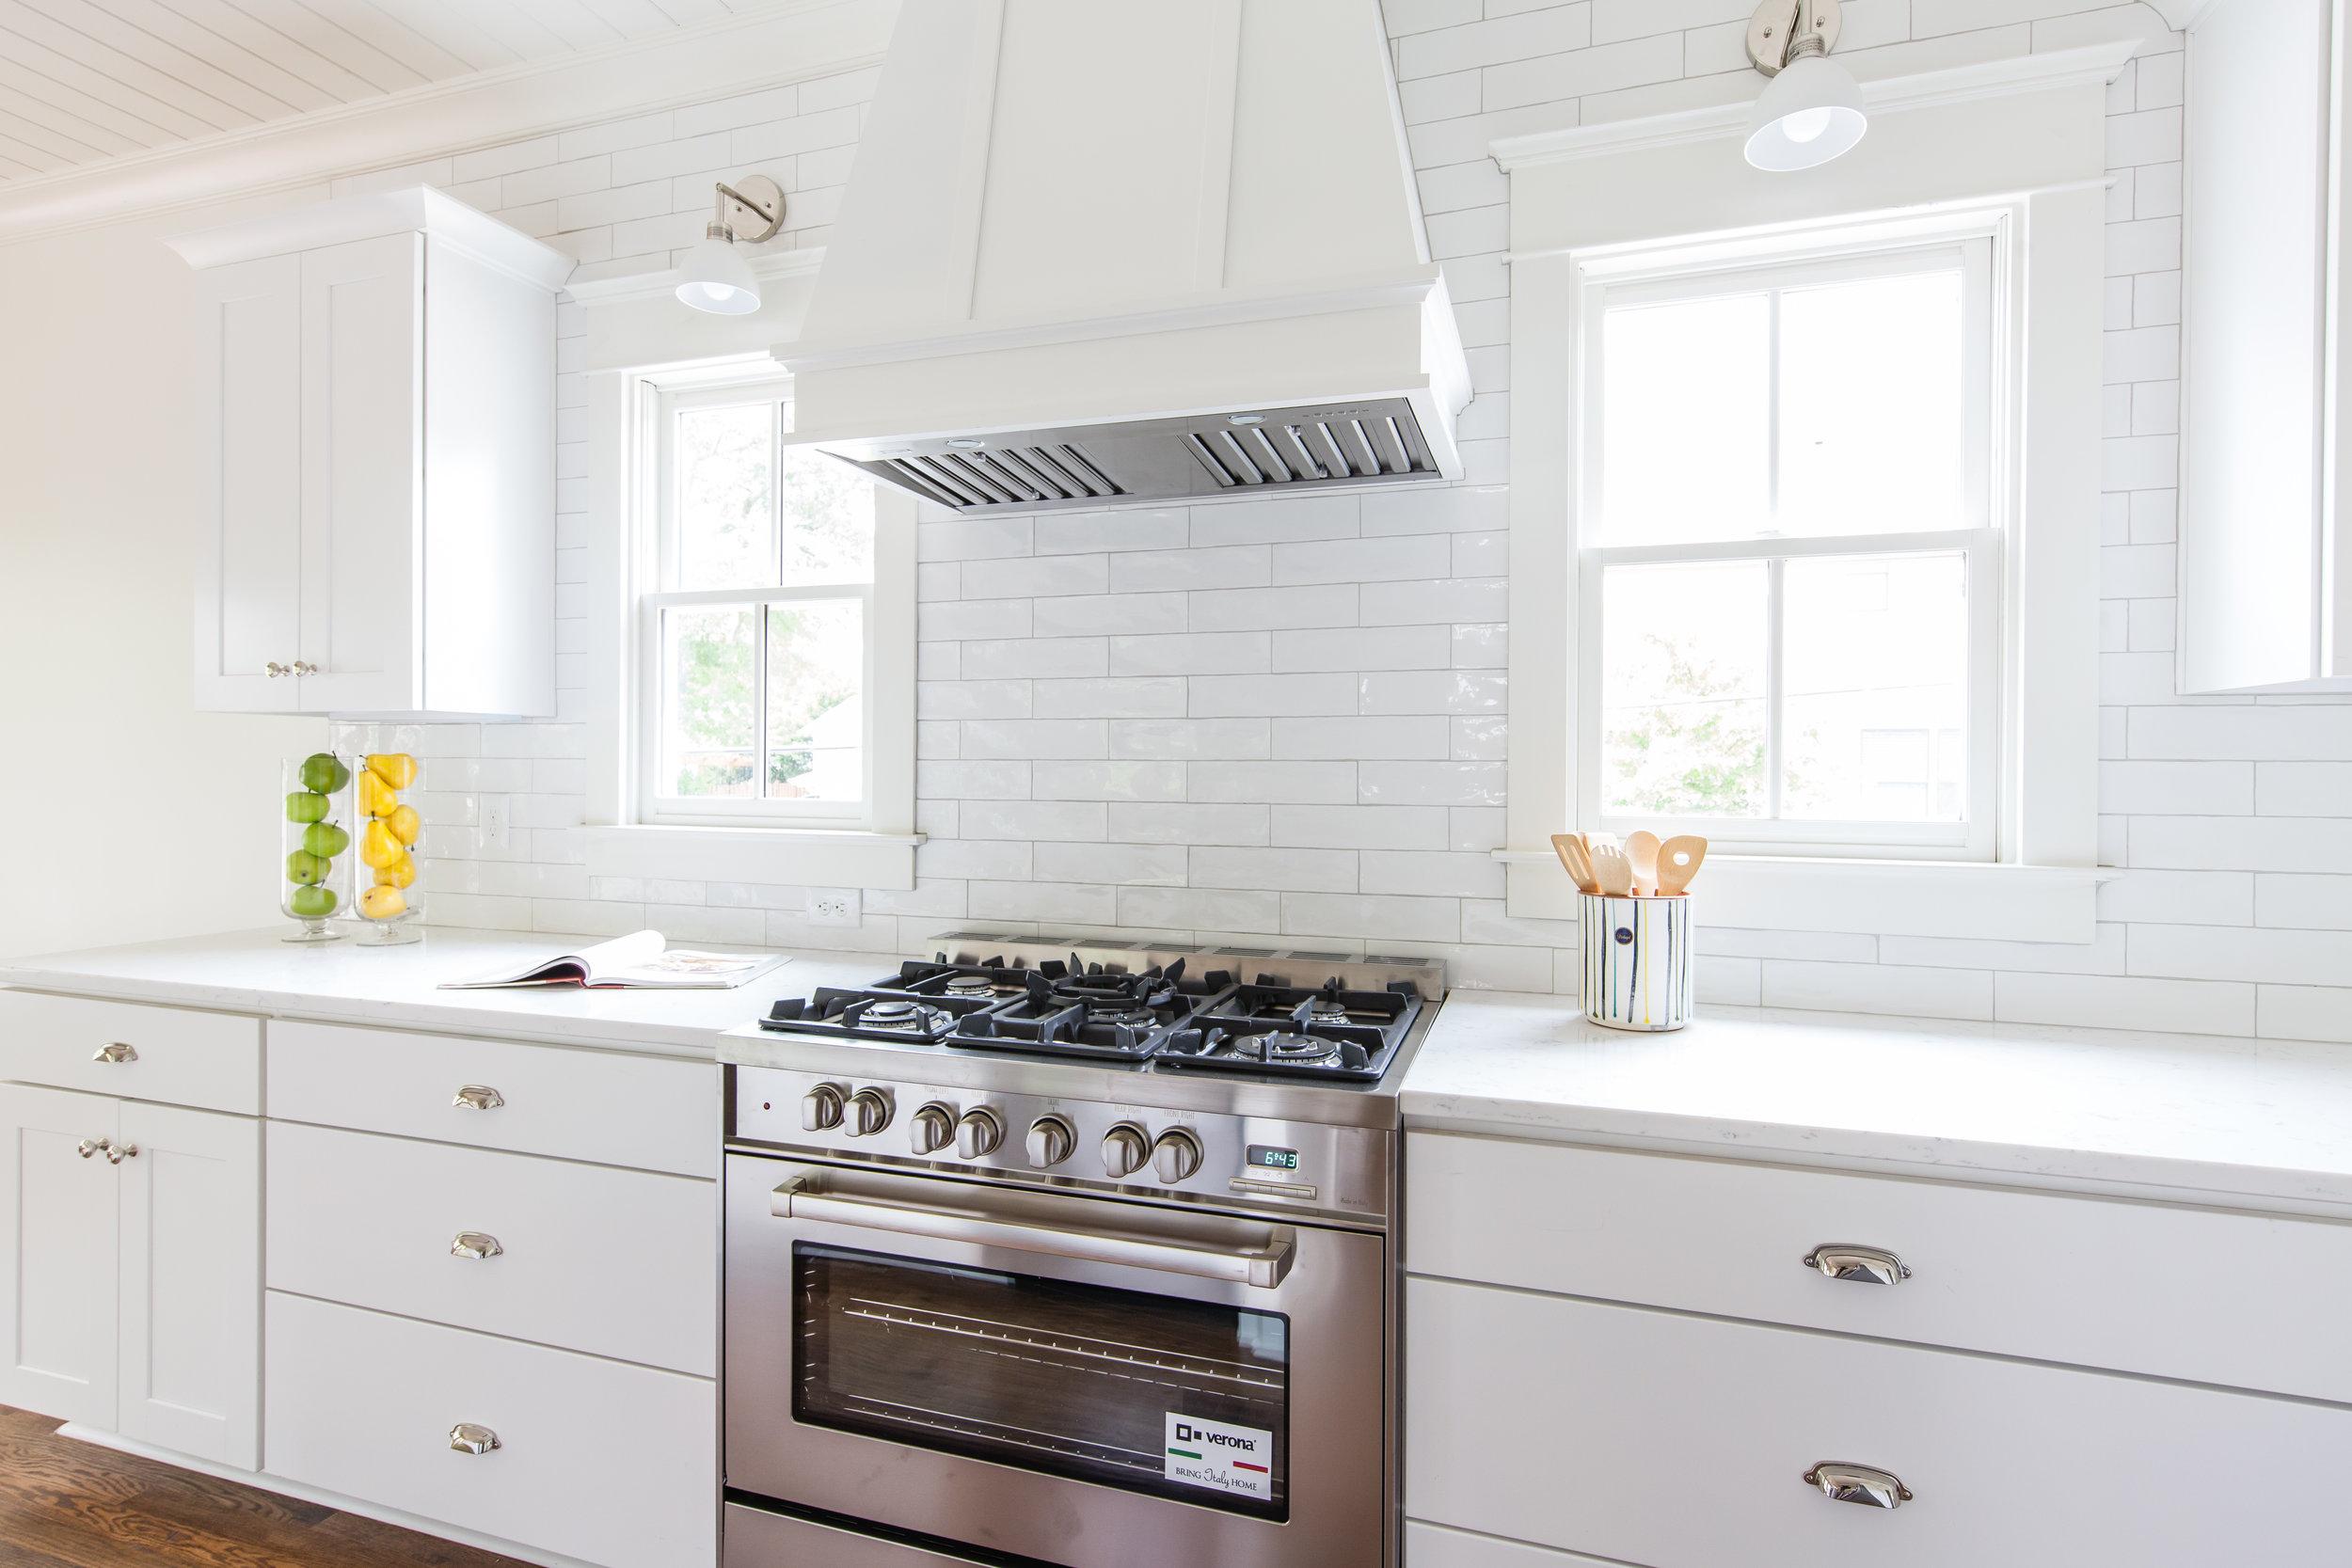 303 Melrose-Kitchen Stove.jpg